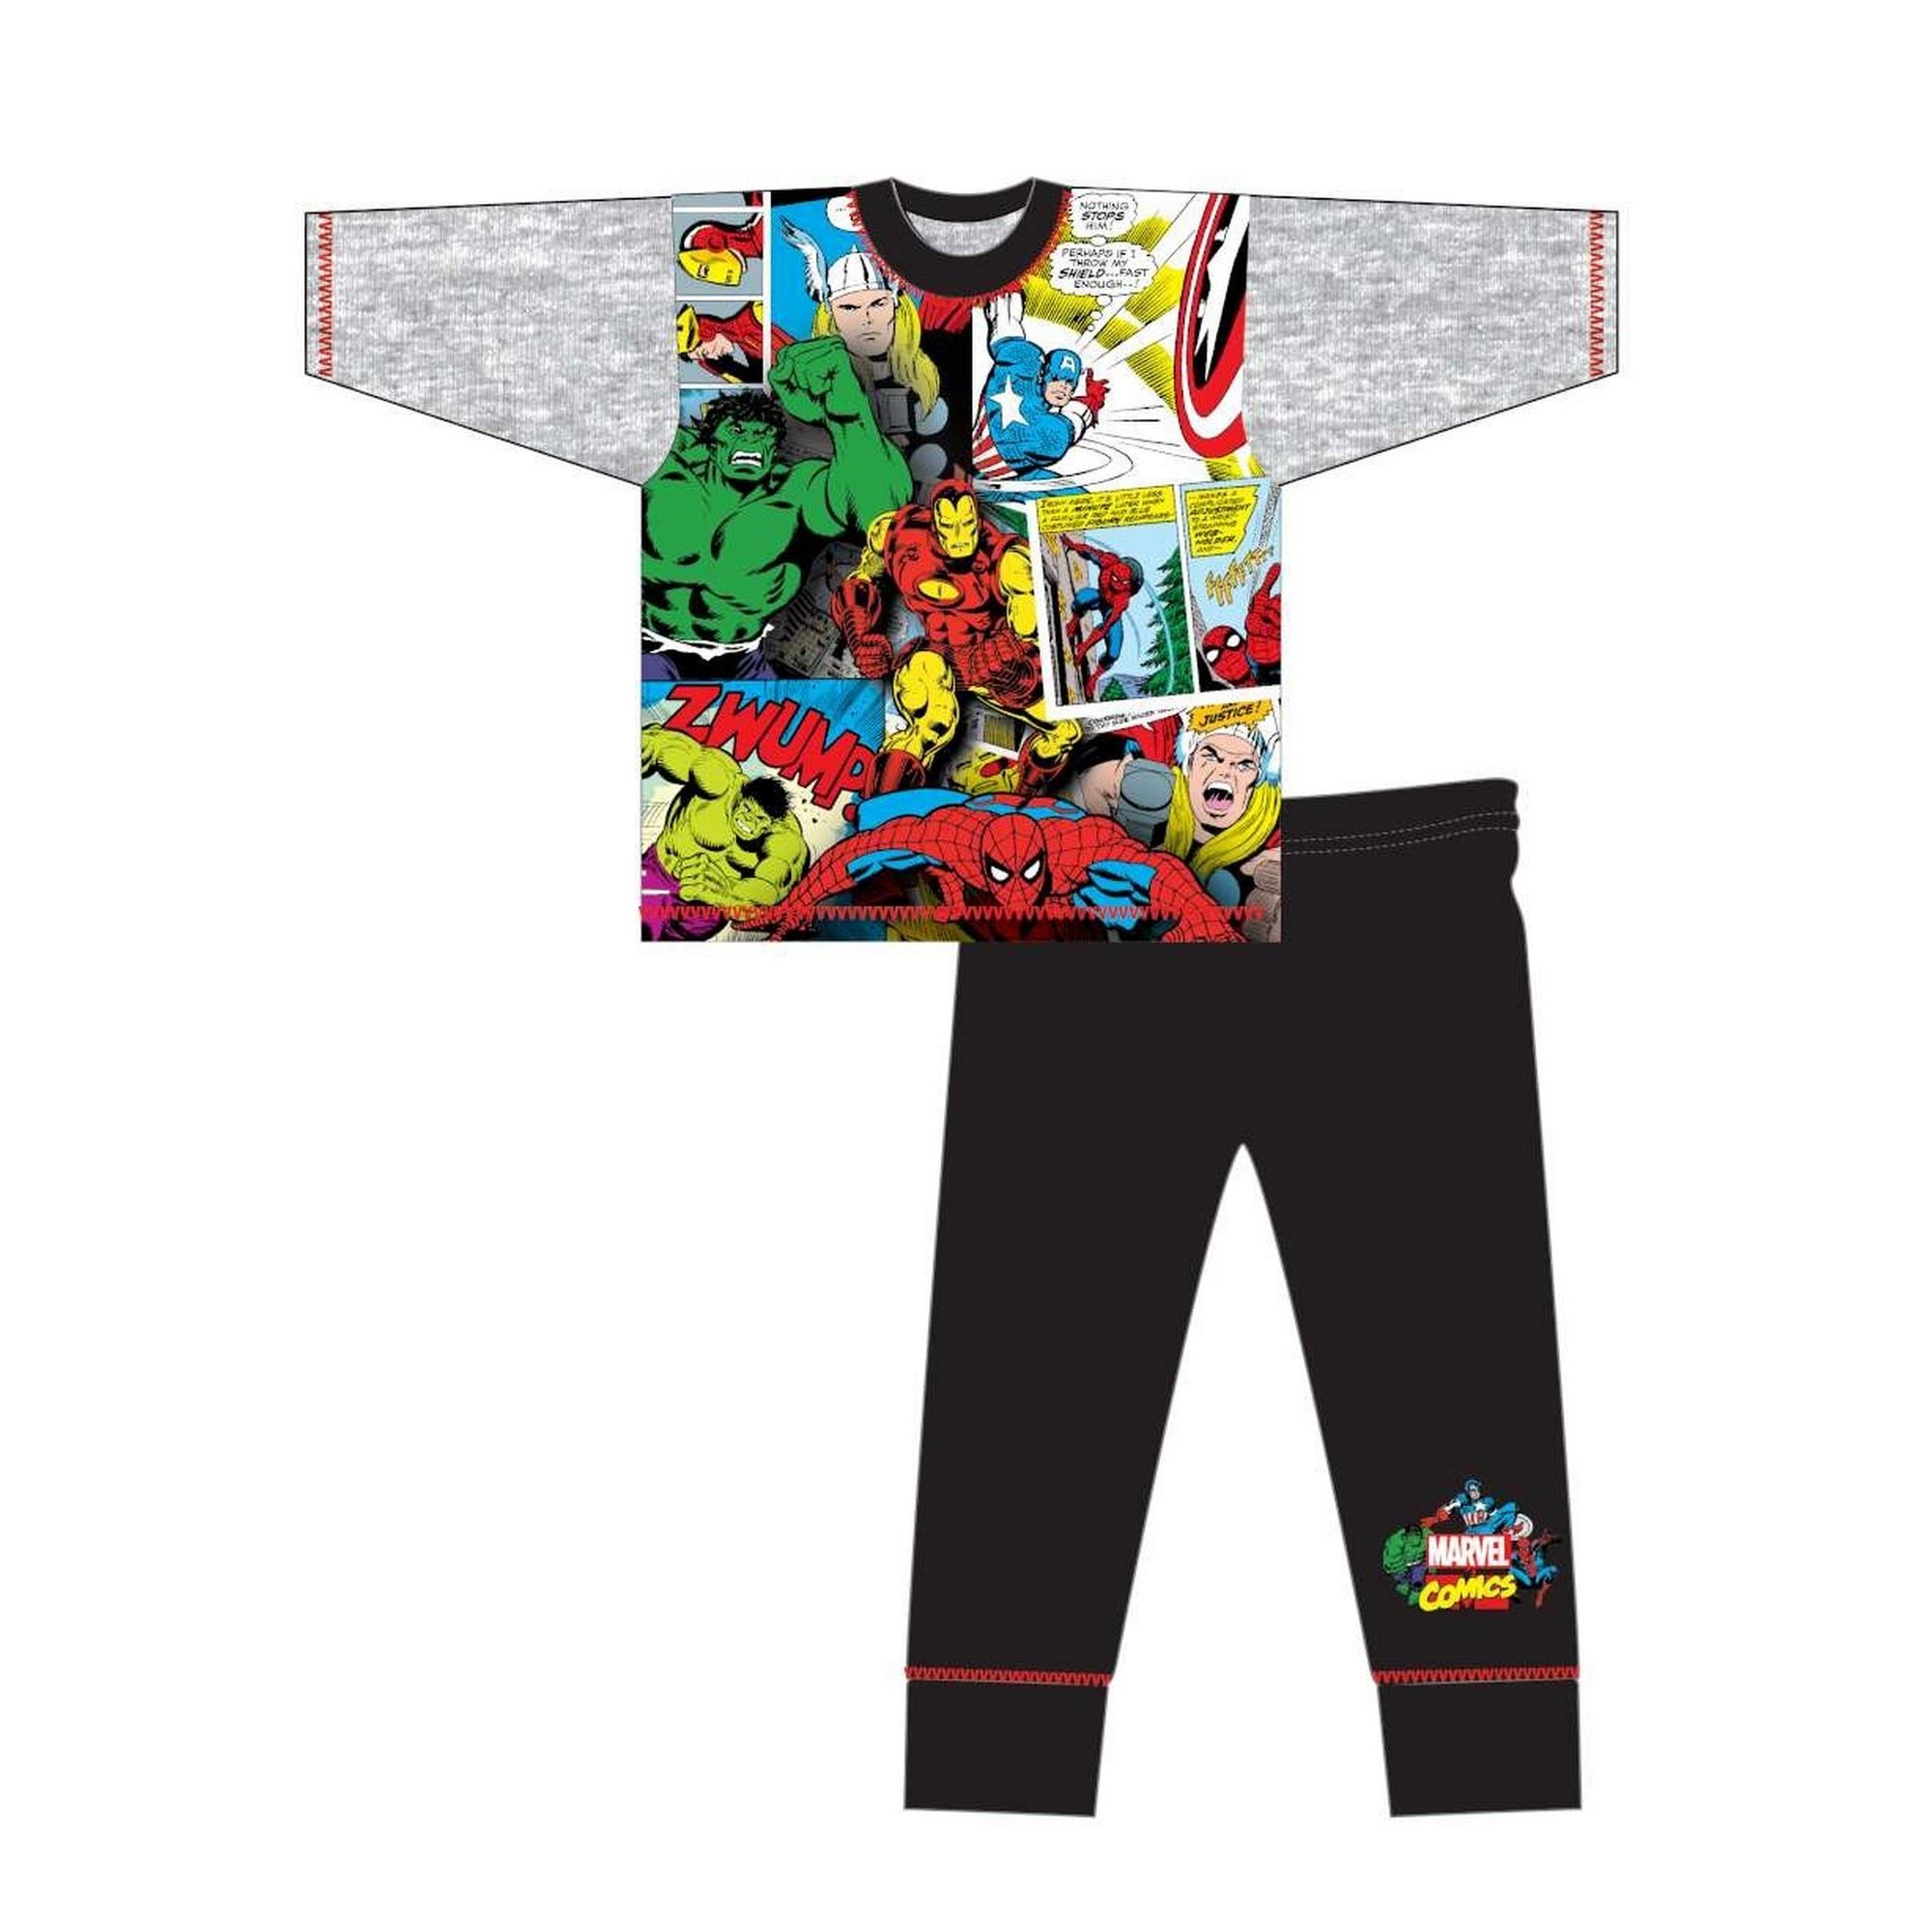 Marvel-Pijama-de-manga-larga-de-los-Vengadores-TF544